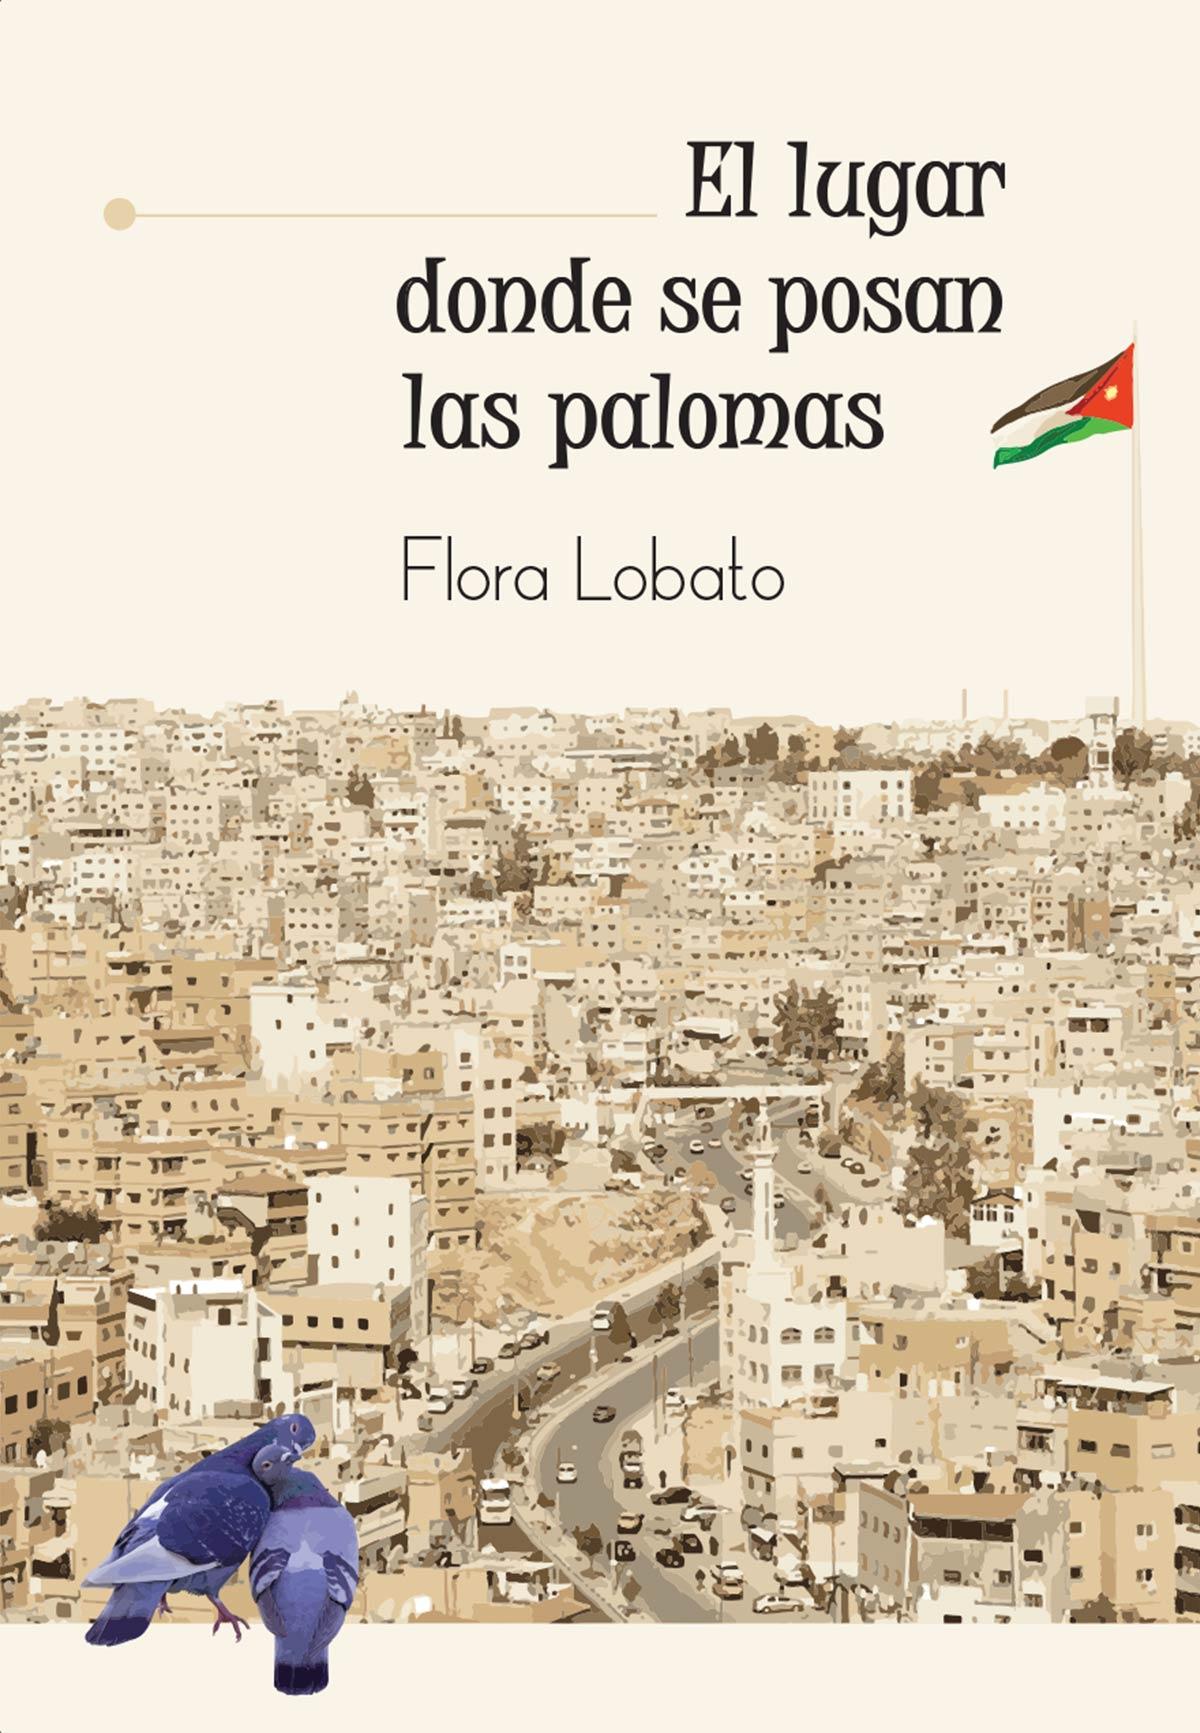 novela lugar donde posan palomas Flora Lobato editorial semuret